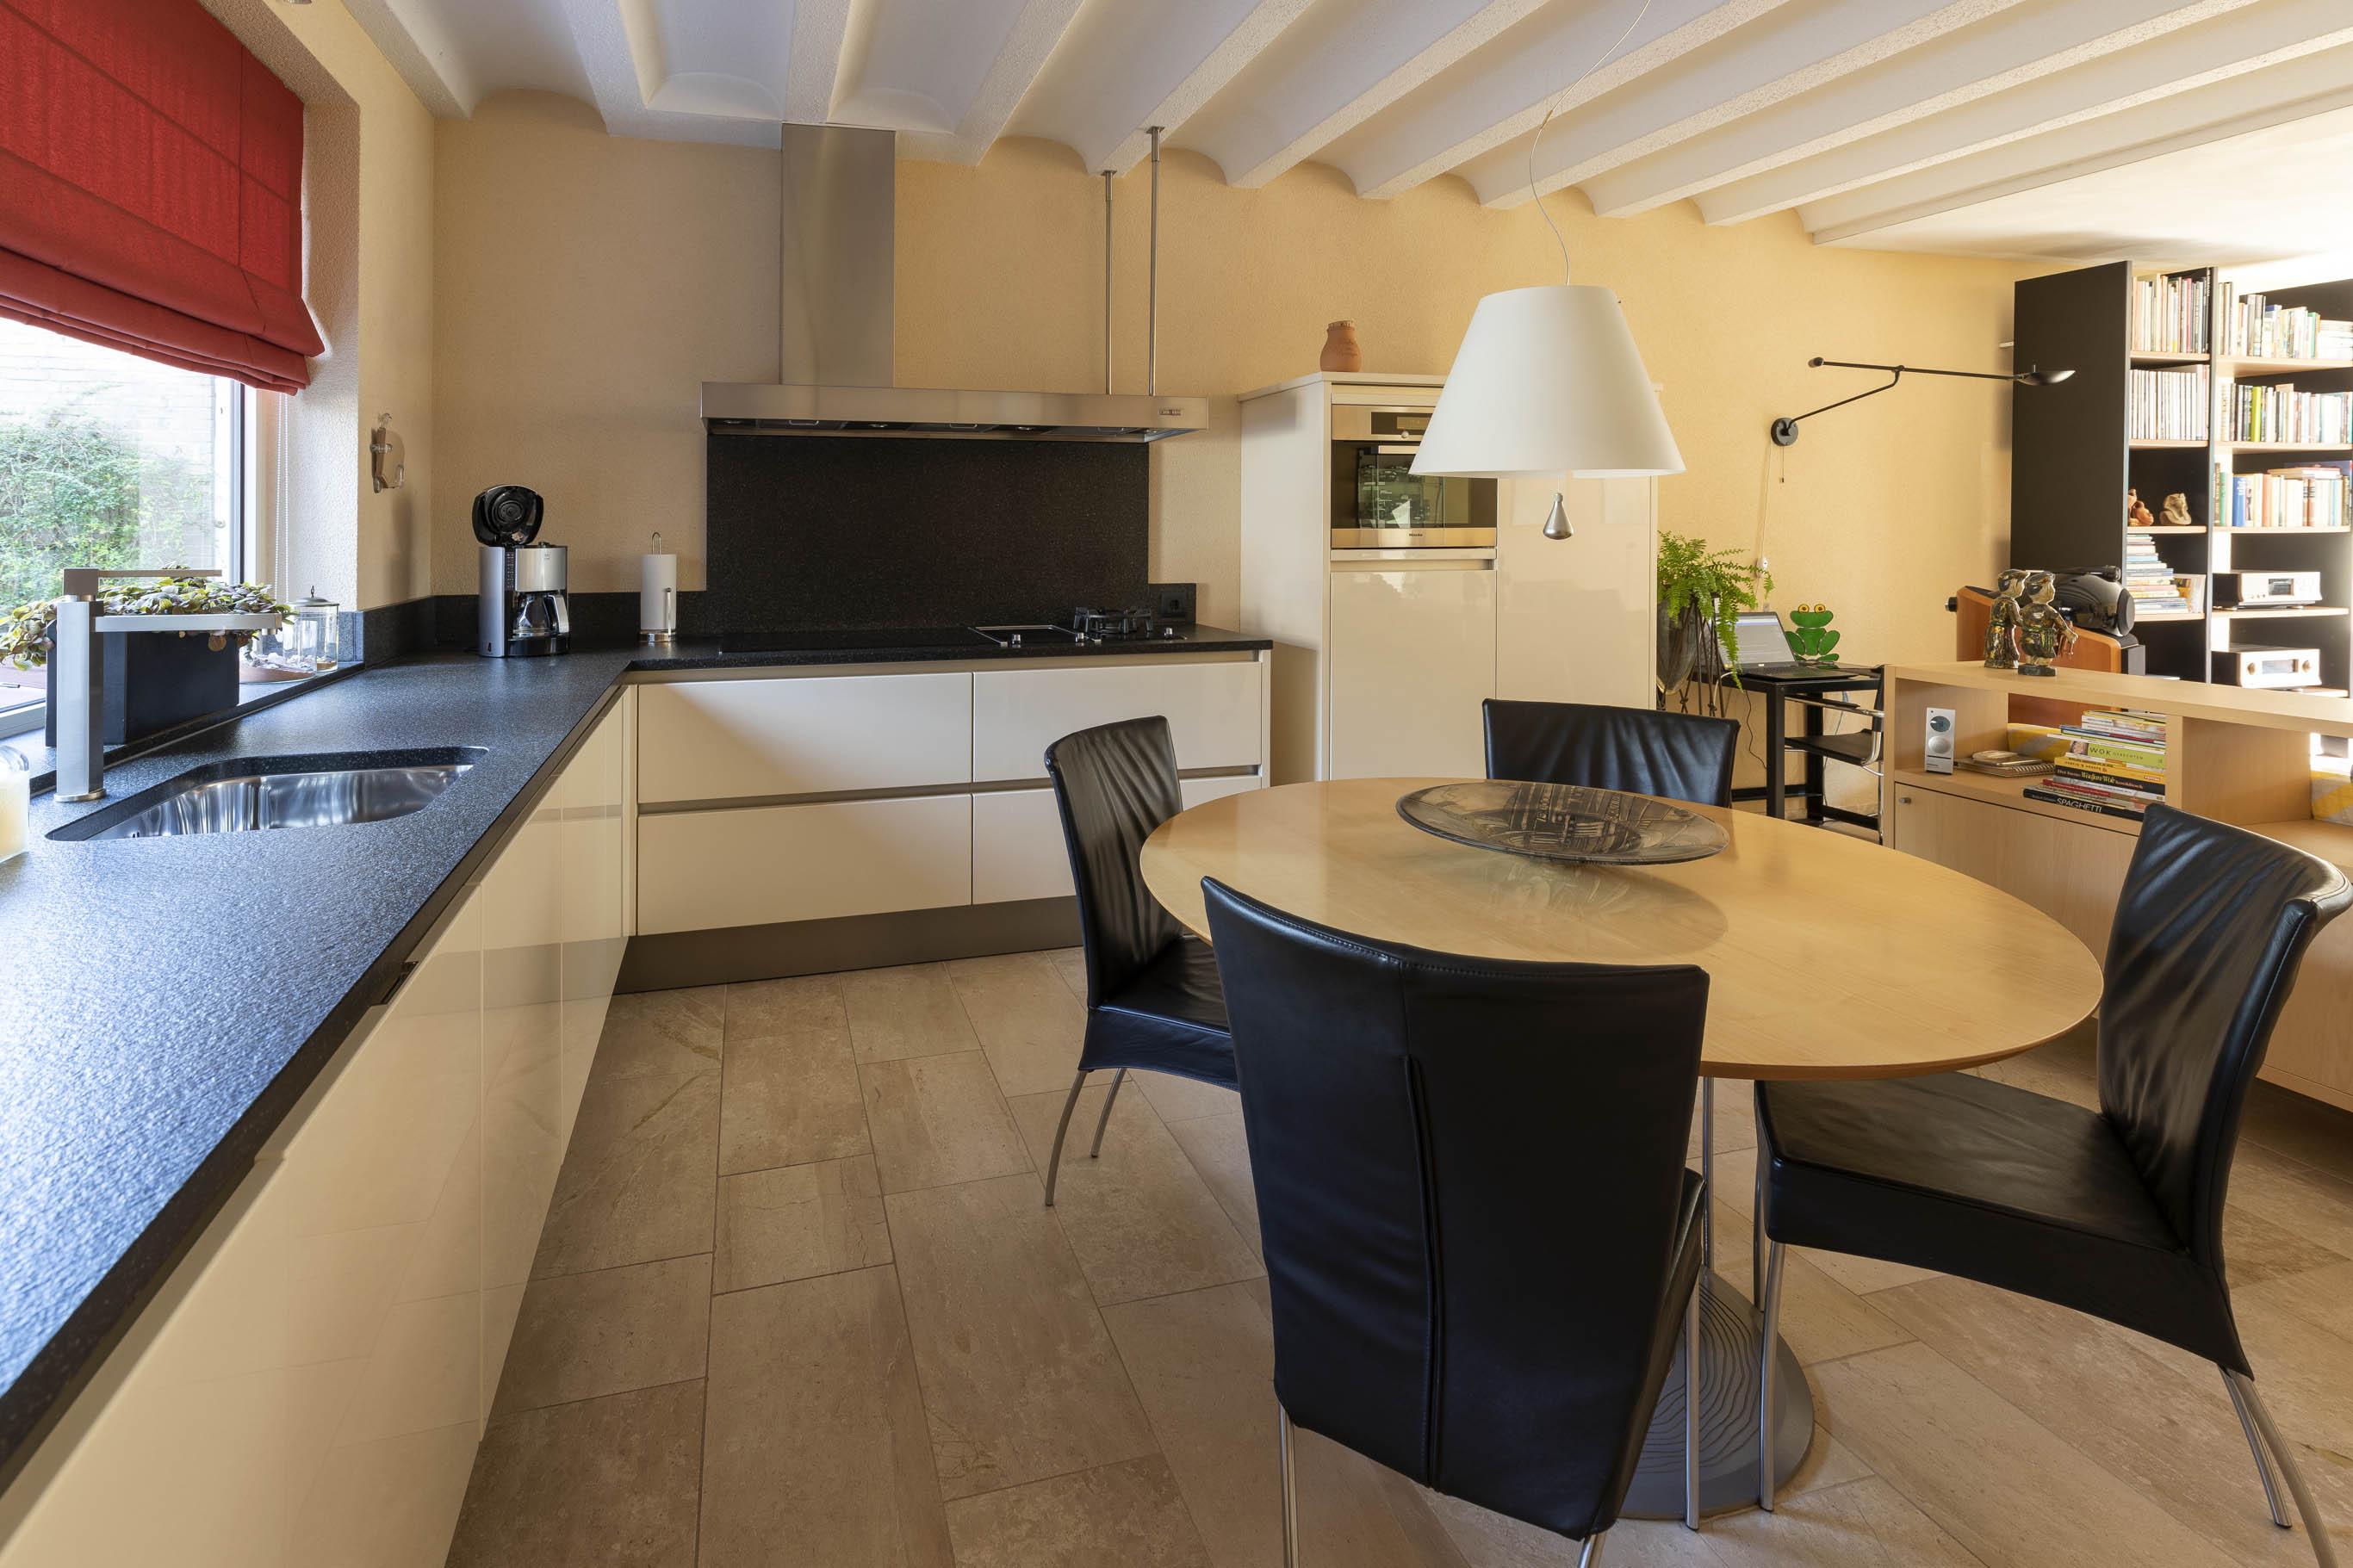 5371EN Ravenstein, Nederland, 3 Bedrooms Bedrooms, ,Huis,Koop,Portugalhof,1229